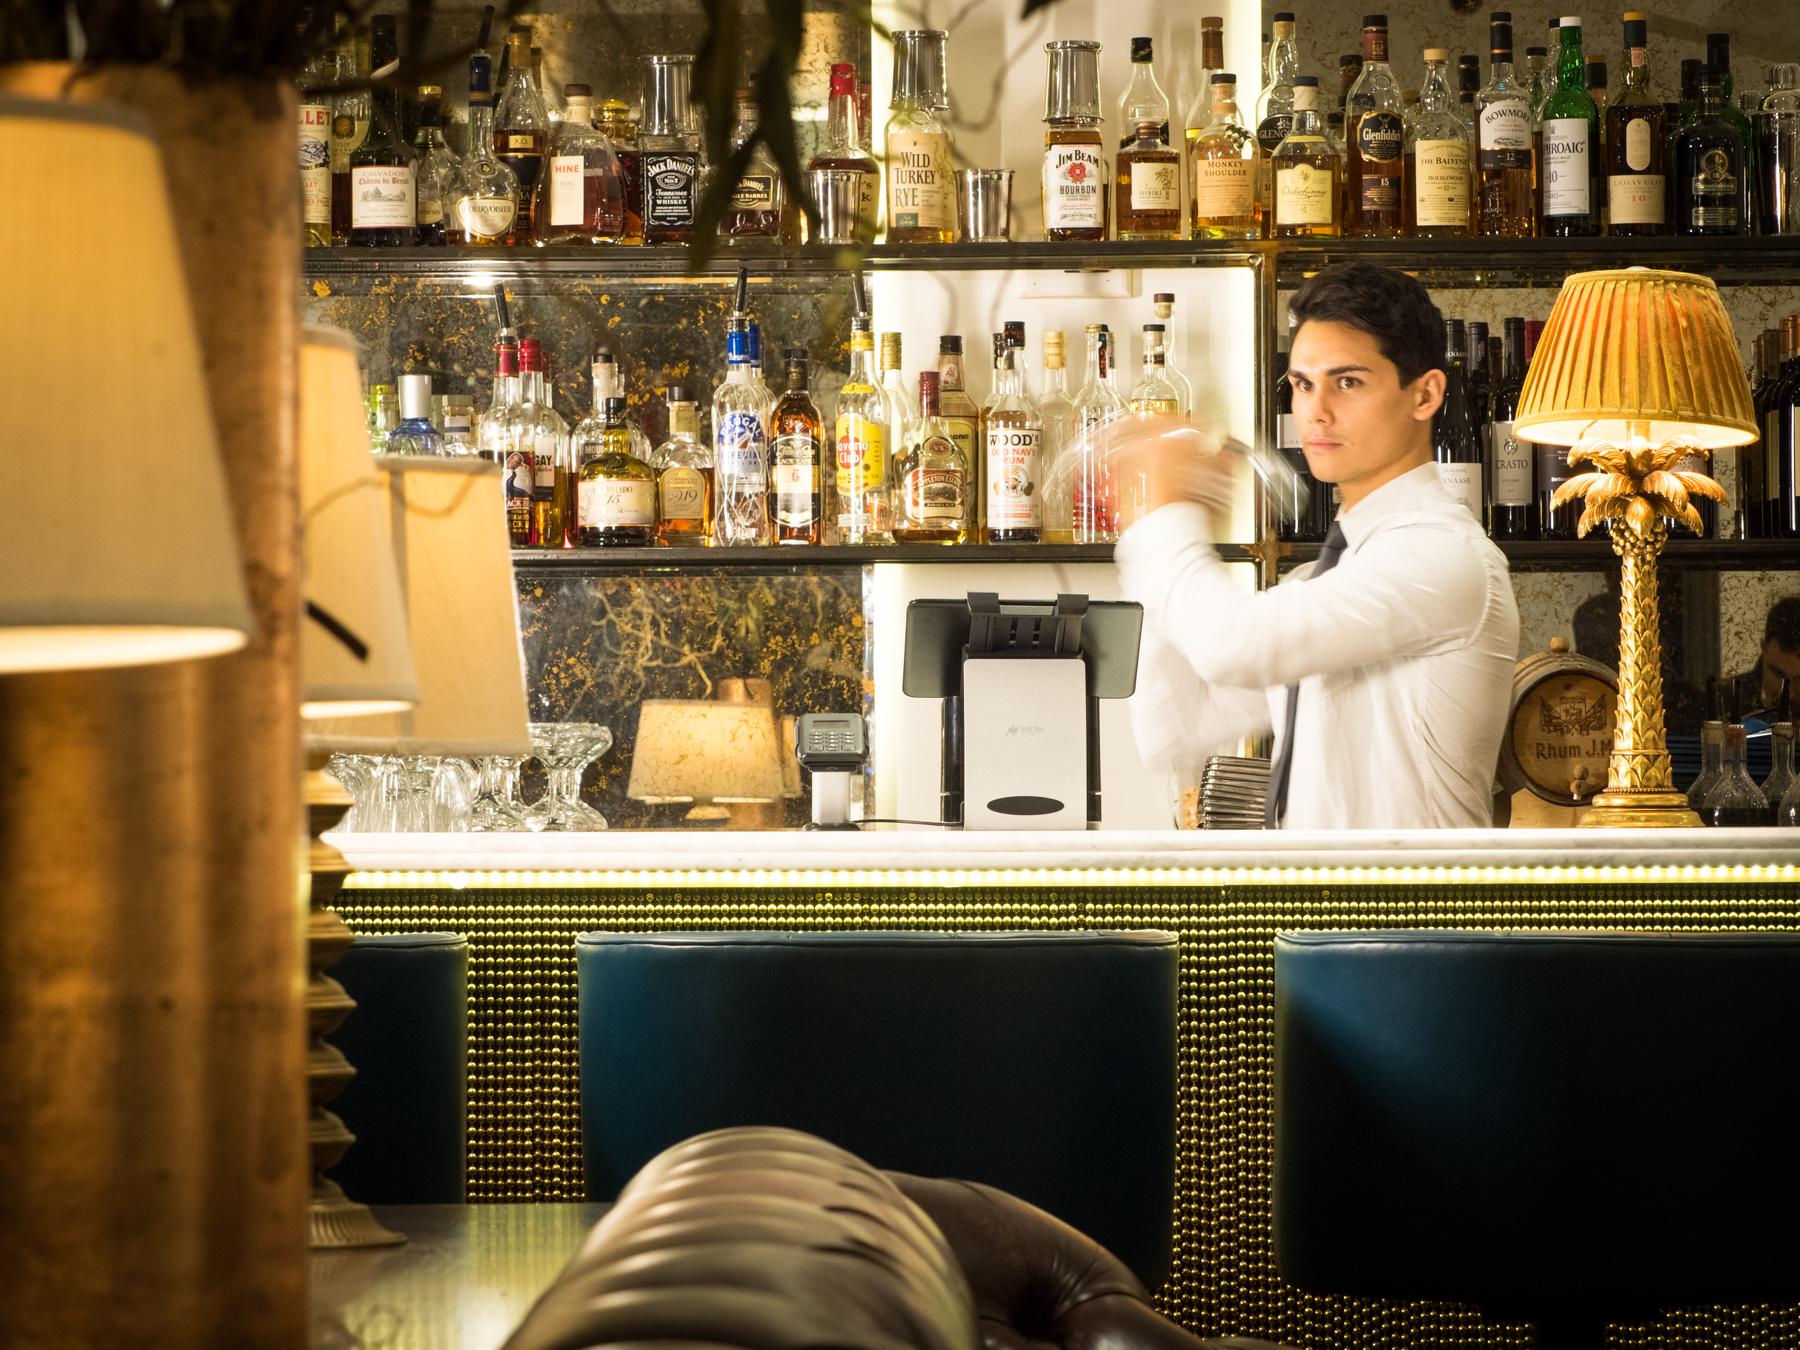 Miura POSzle in a bar